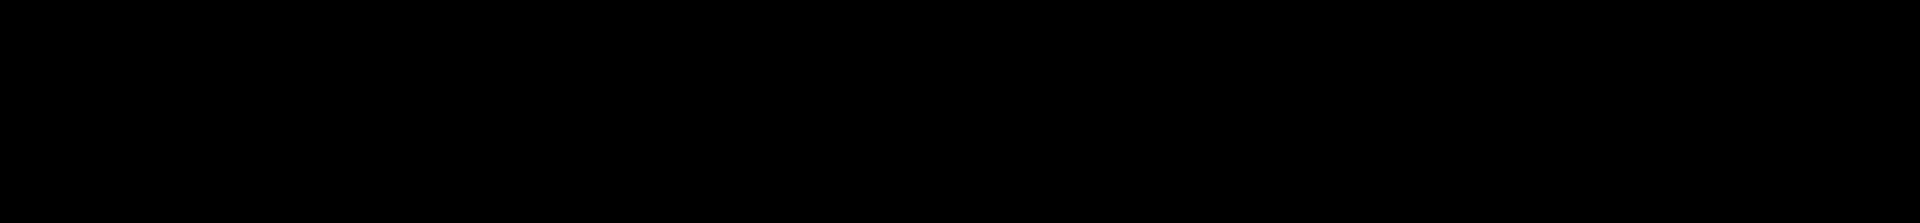 Fuente de alimentación TN850W Gold Modular imagen descripción